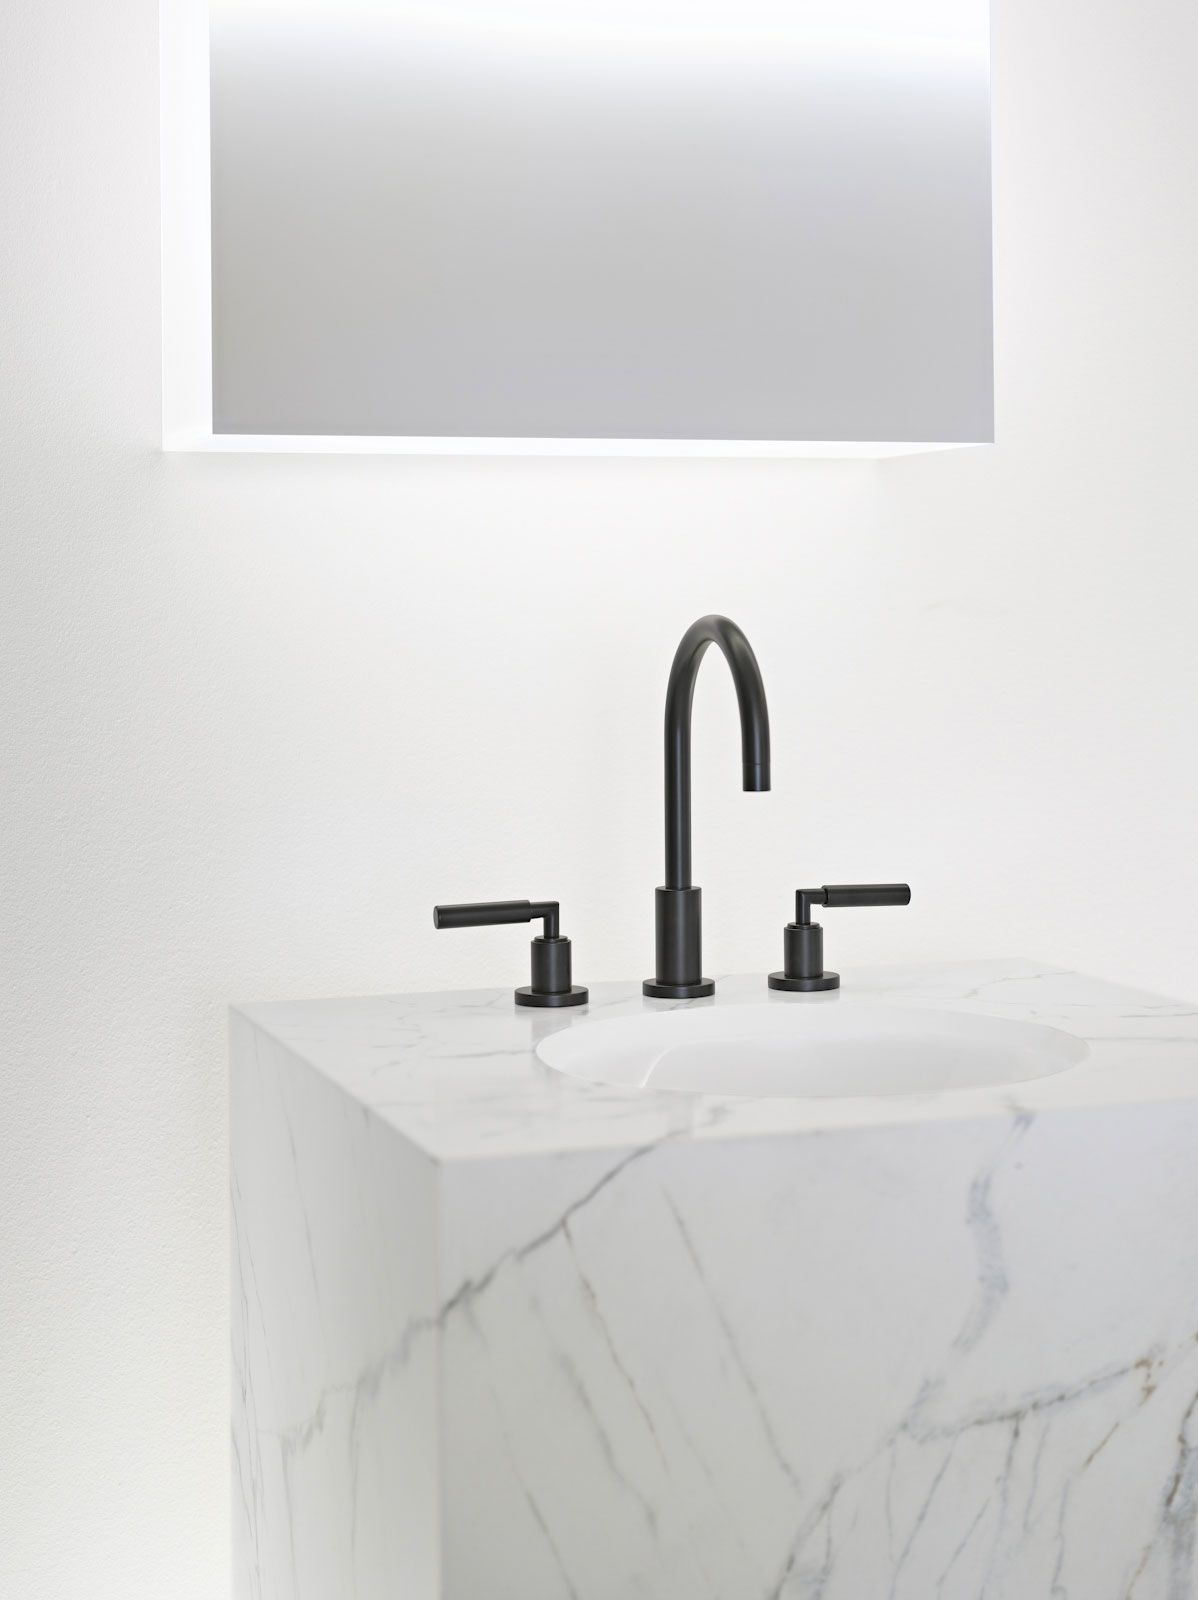 Tara Bath Spa Fitting Dornbracht BaTHs Pinterest Spa - Dornbracht bathroom faucet